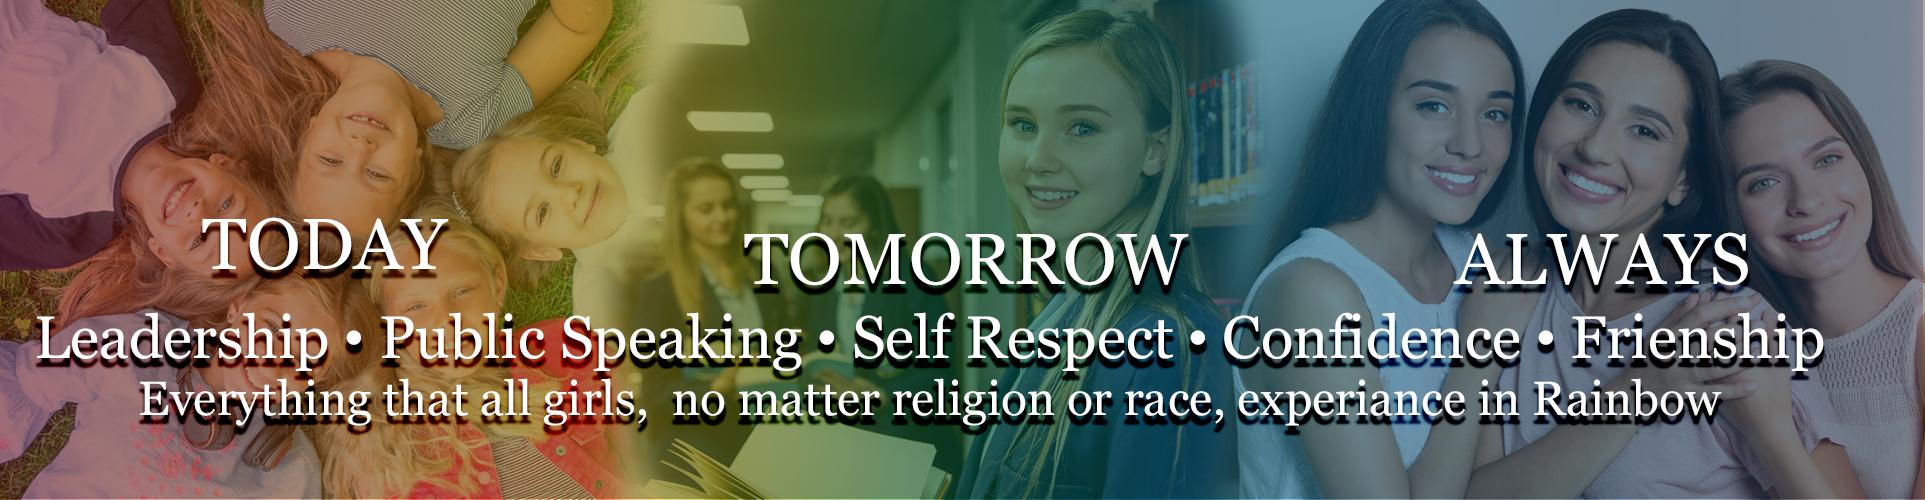 Michigan Rainbow - International Order of Rainbow for Girls - Today, Tomorrow, Always